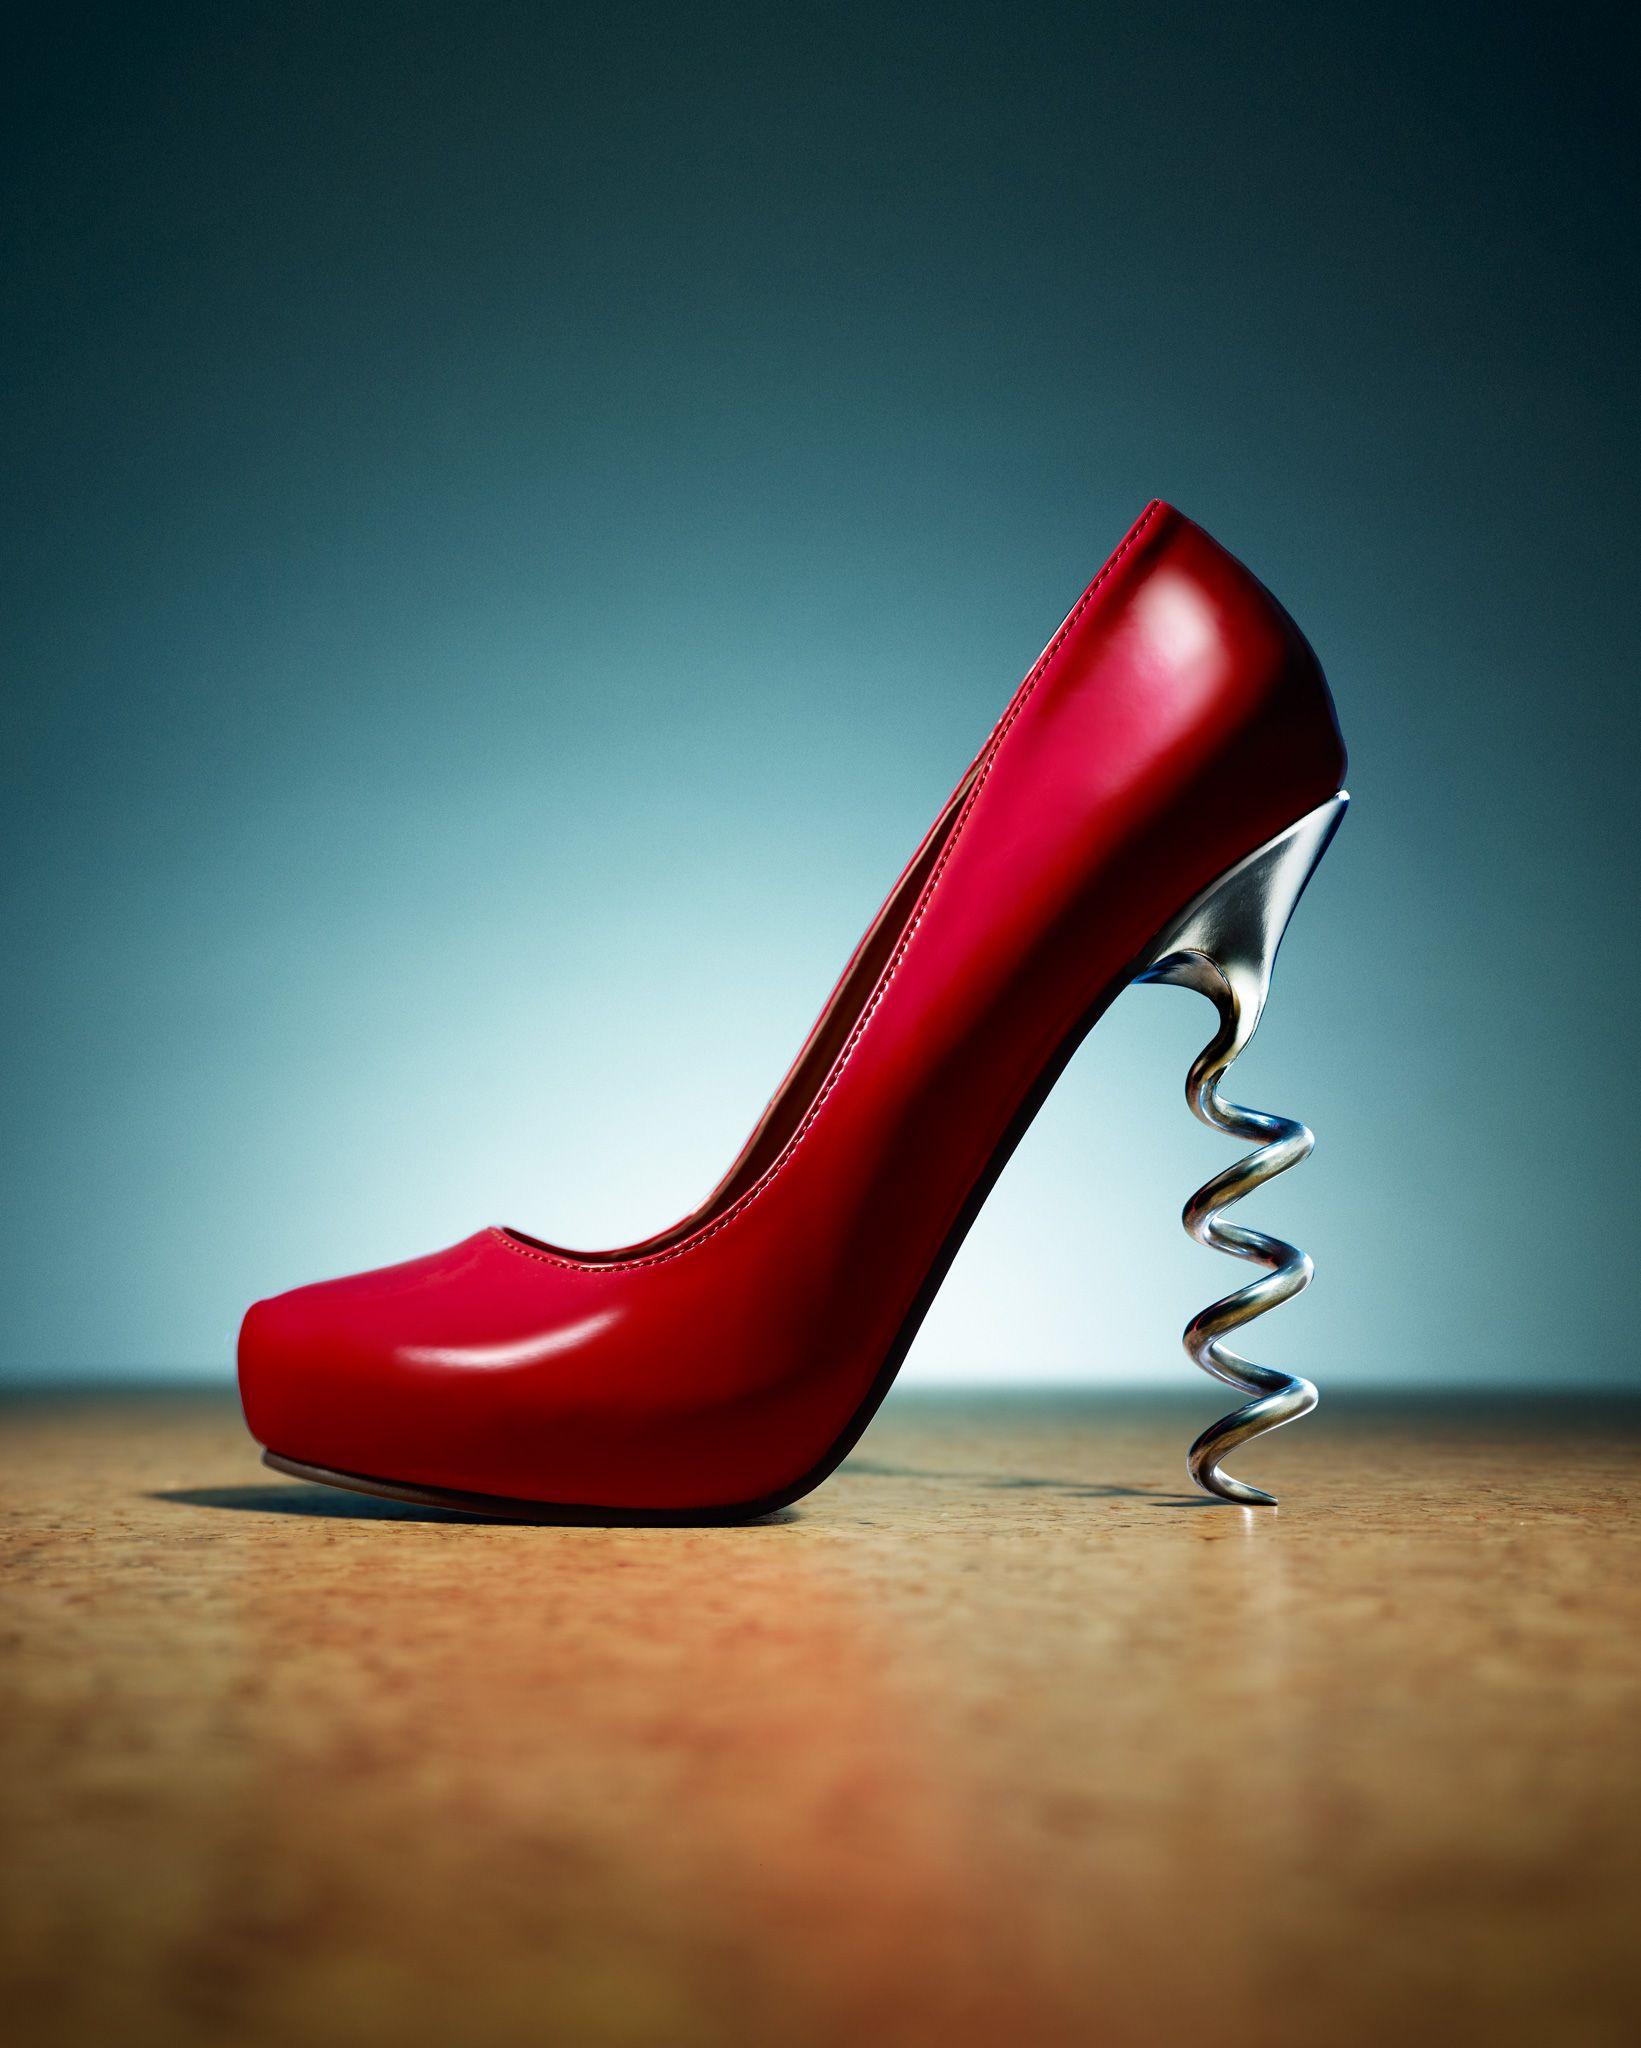 History of high heels fashion 14